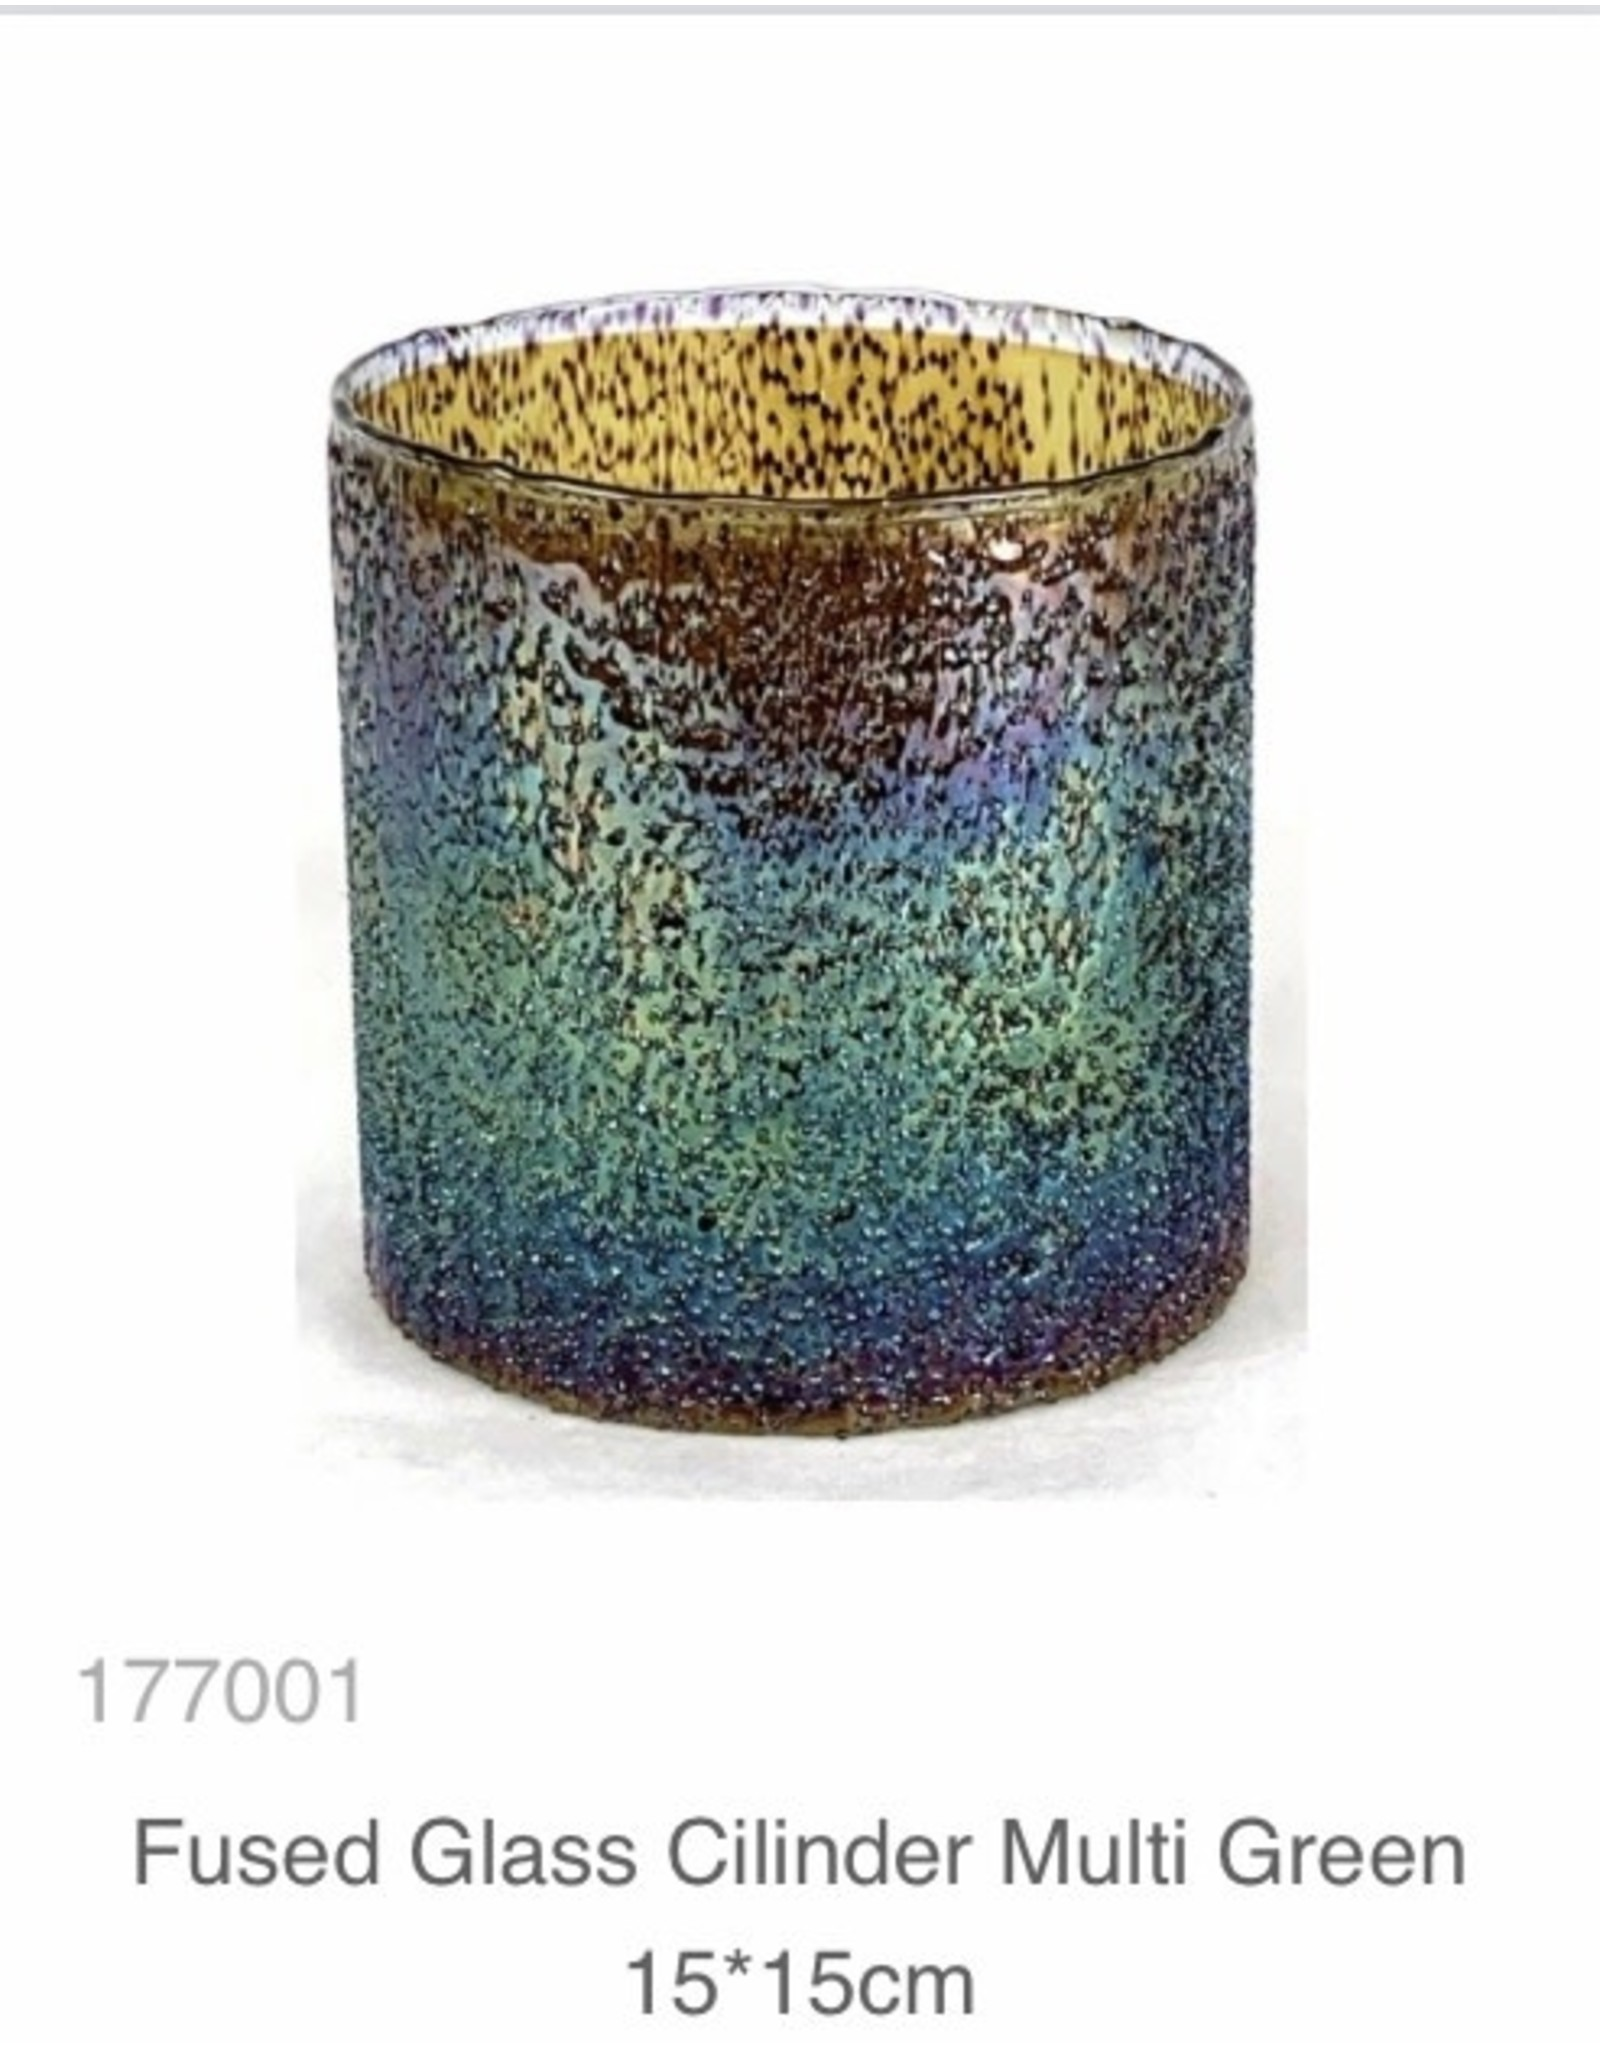 MANSION Fused Glass Cilinder Multi Green 15*15cm vaas